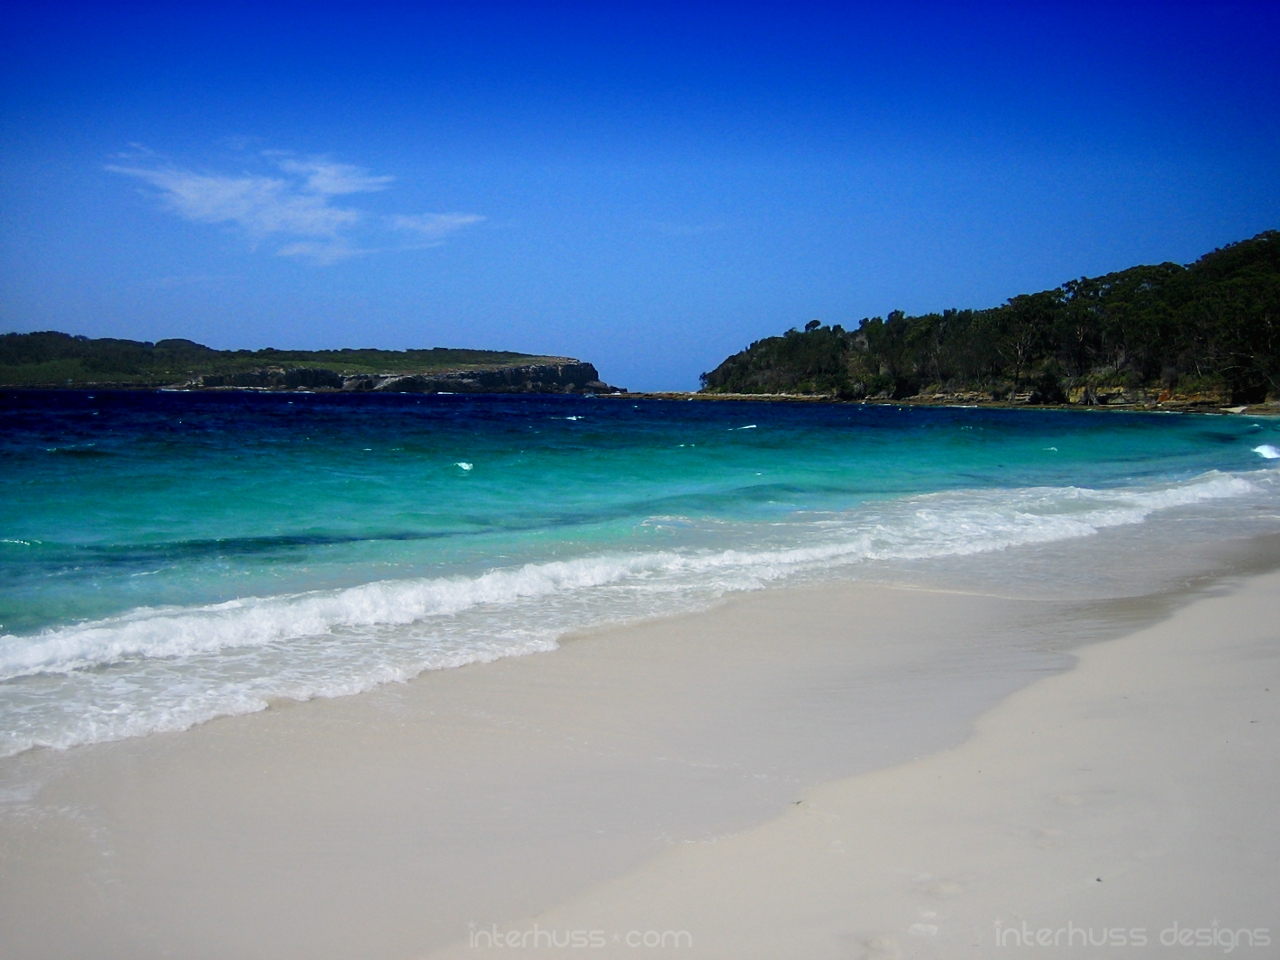 http://4.bp.blogspot.com/-a1QNaCpSNcU/TkNDYyhnnWI/AAAAAAAAAMg/ytUgR9w70q4/s1600/calm-blue-ocean.jpg